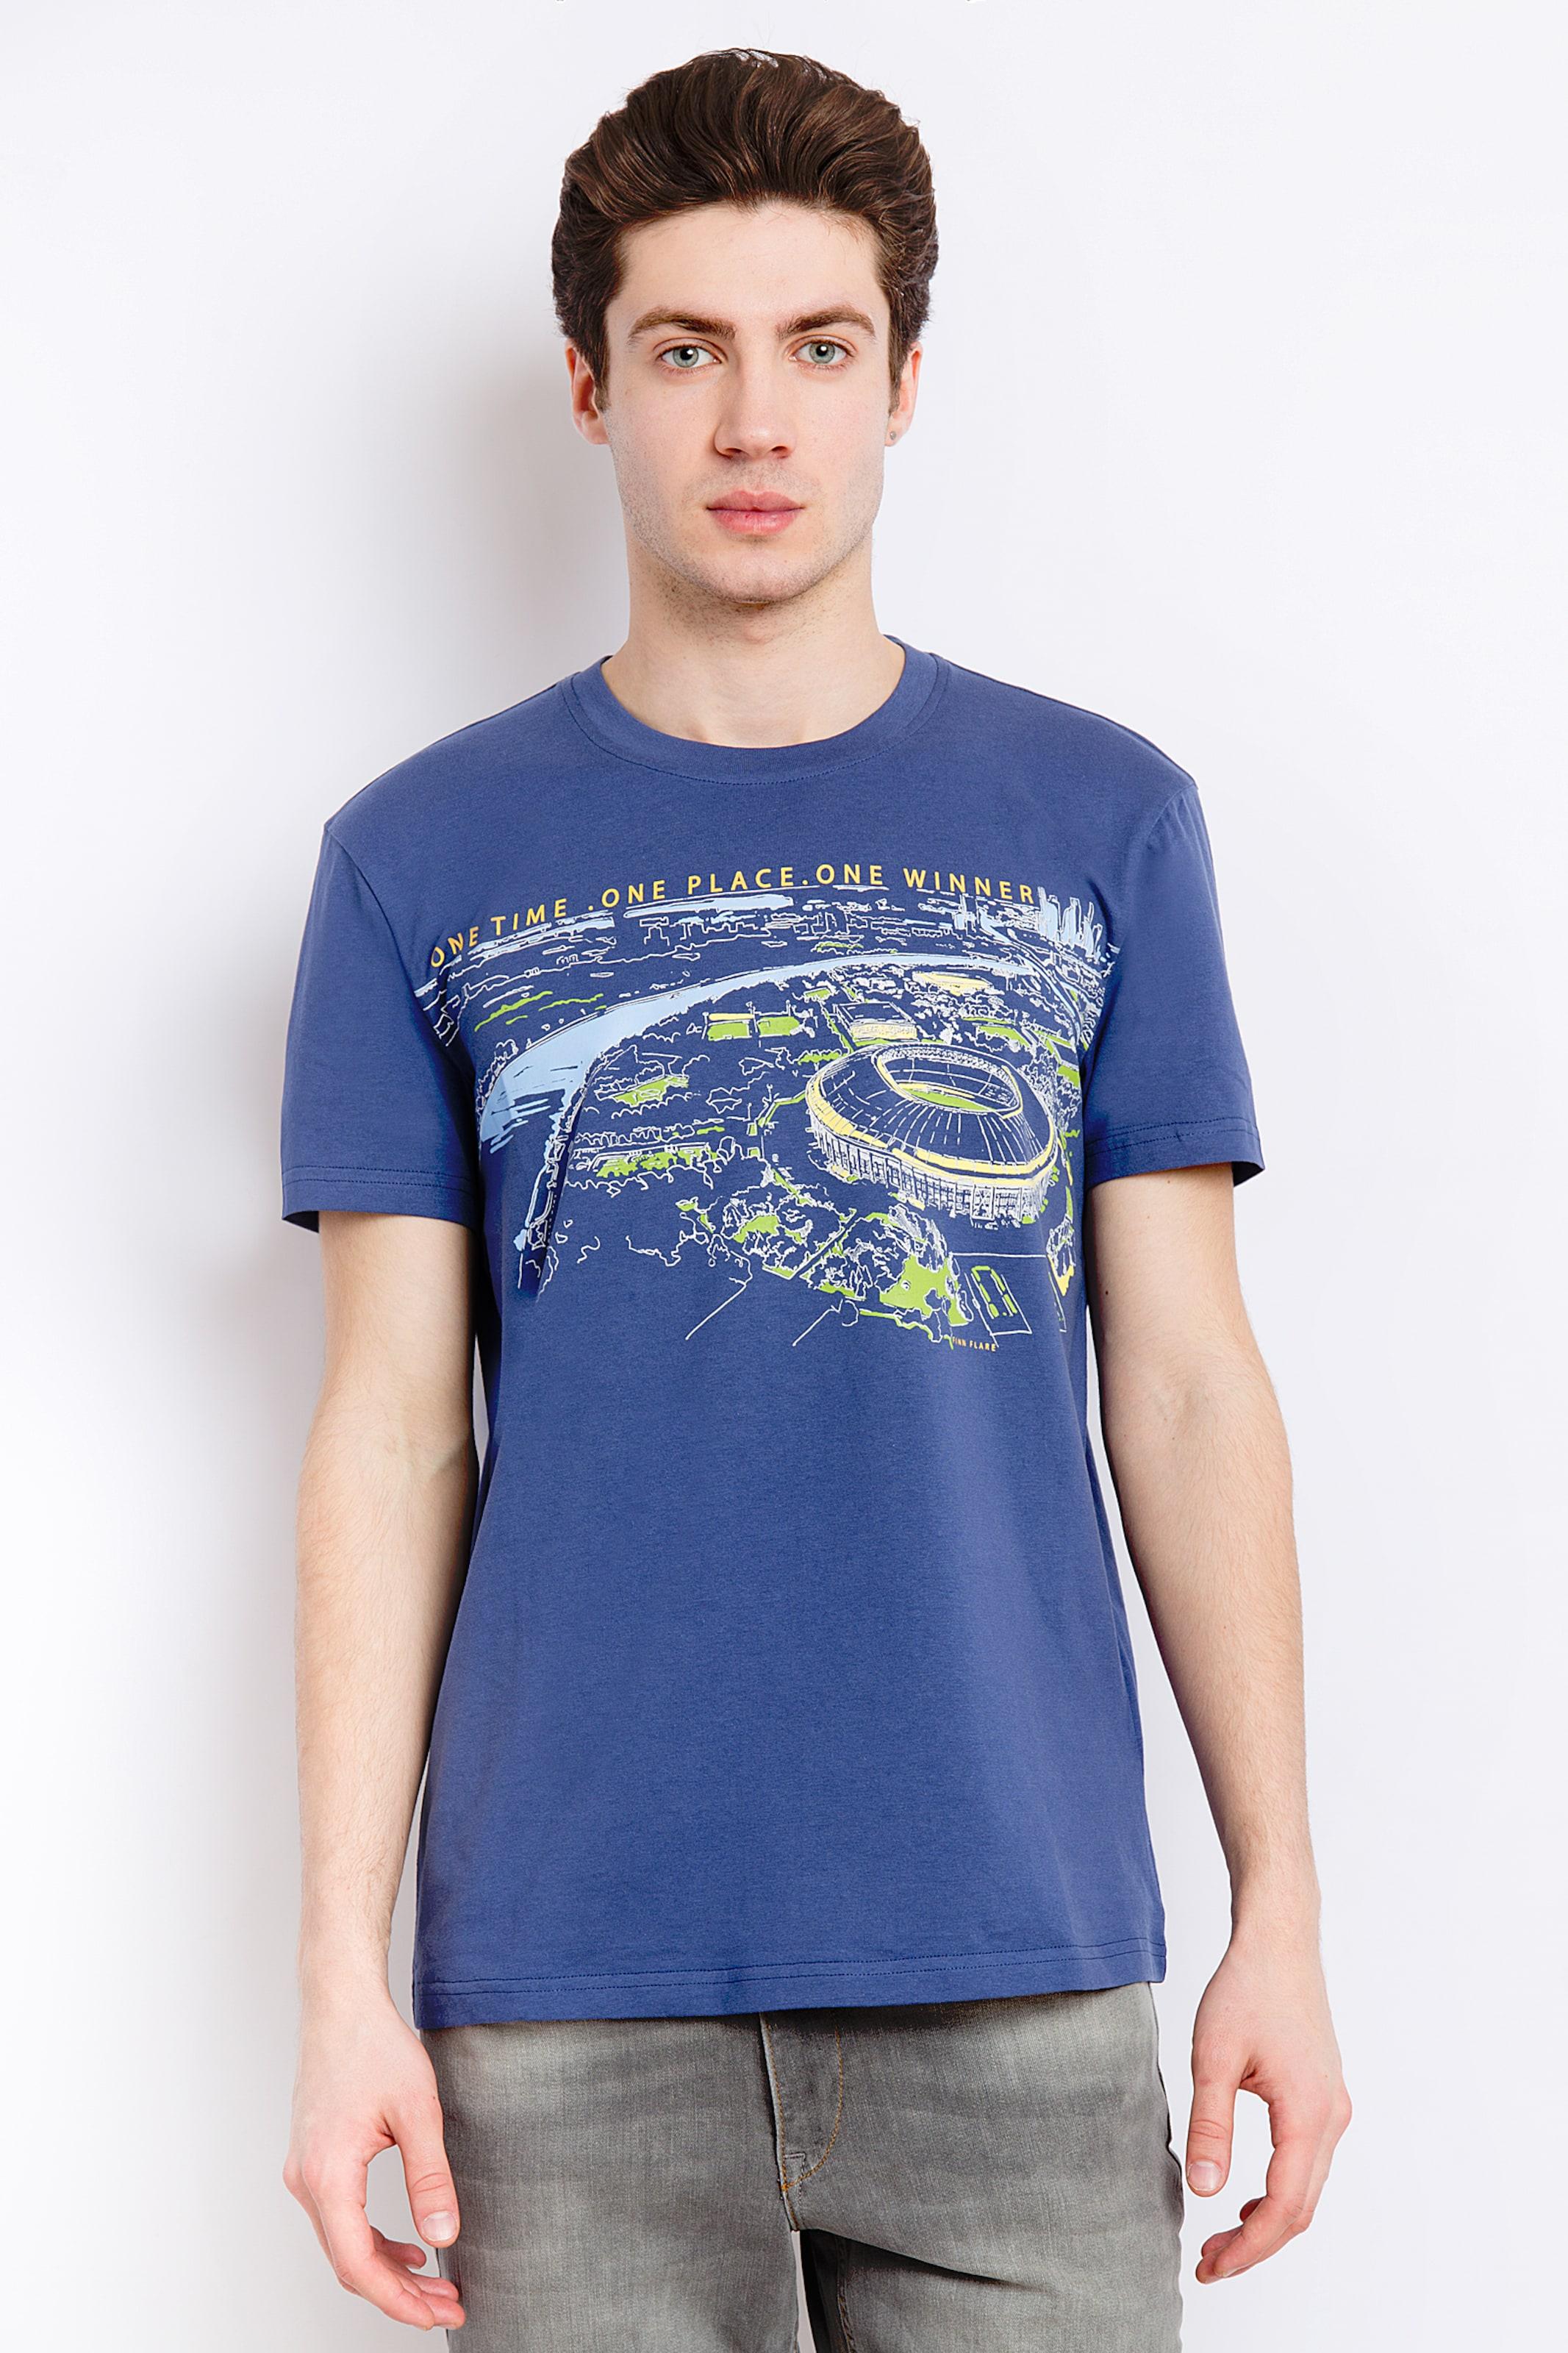 Flare T shirt In Finn Himmelblau pqSUVzGM